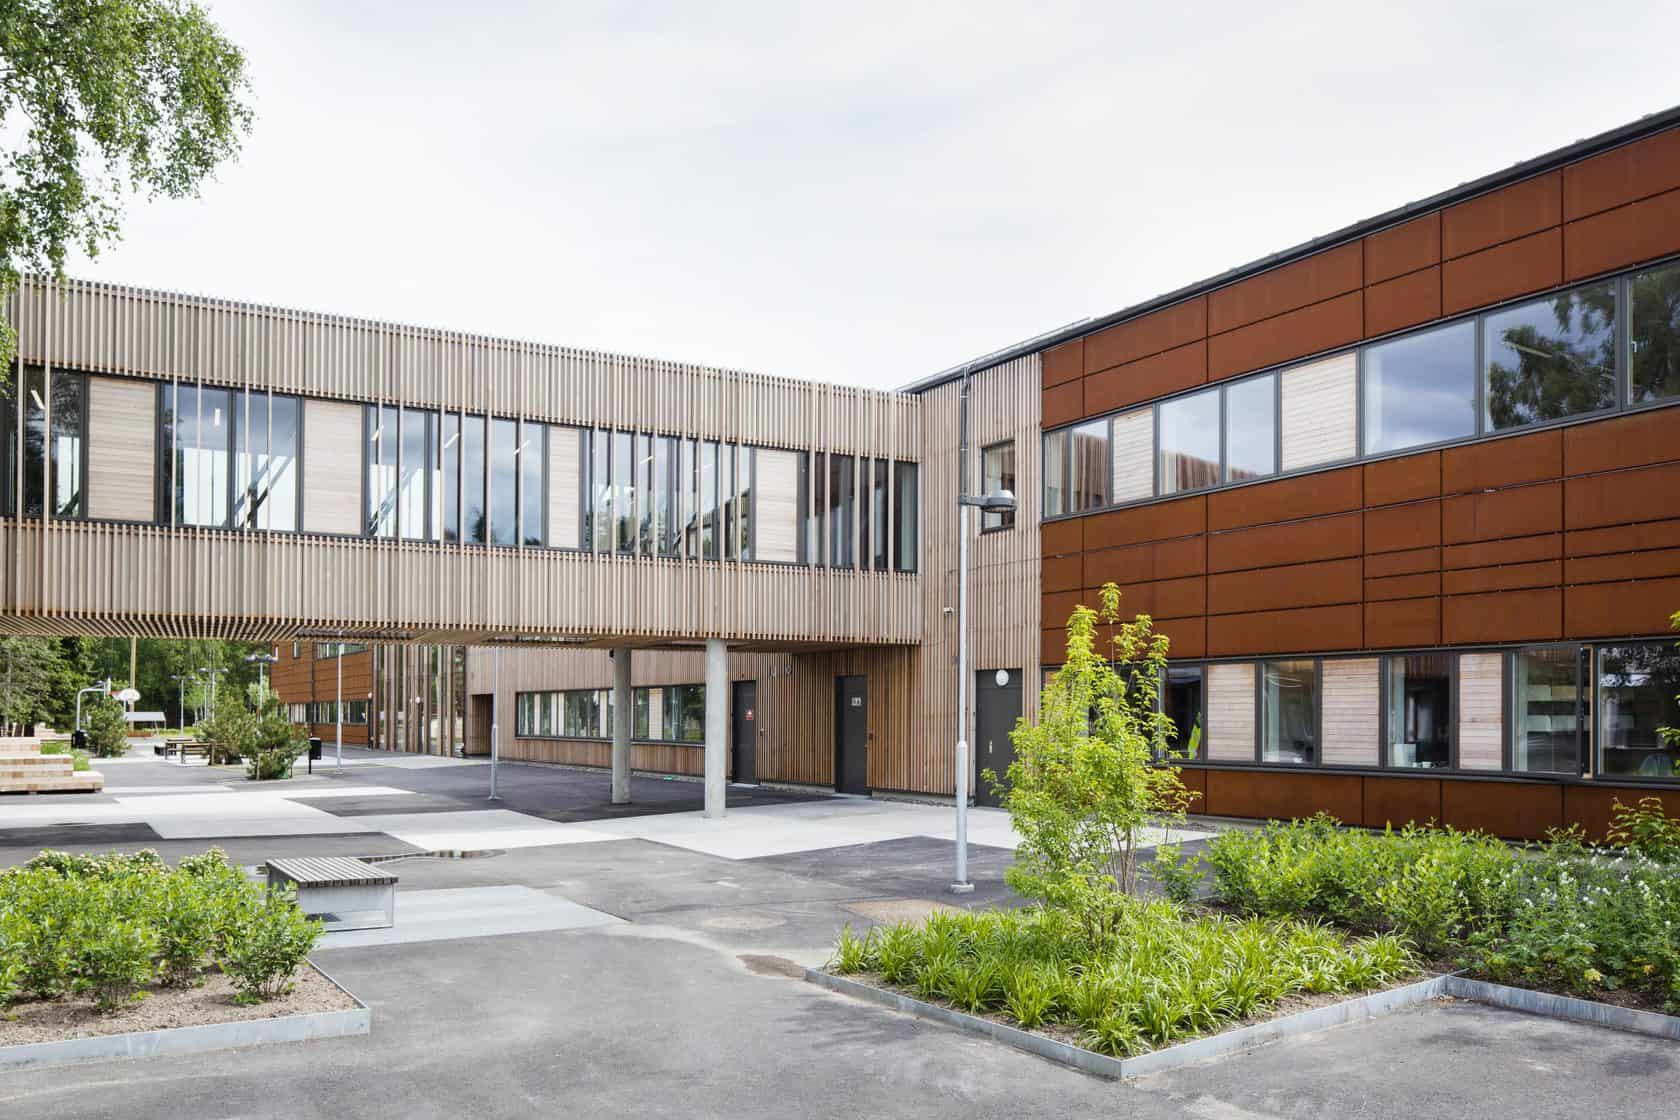 Fredriks Yrkesgymnasium